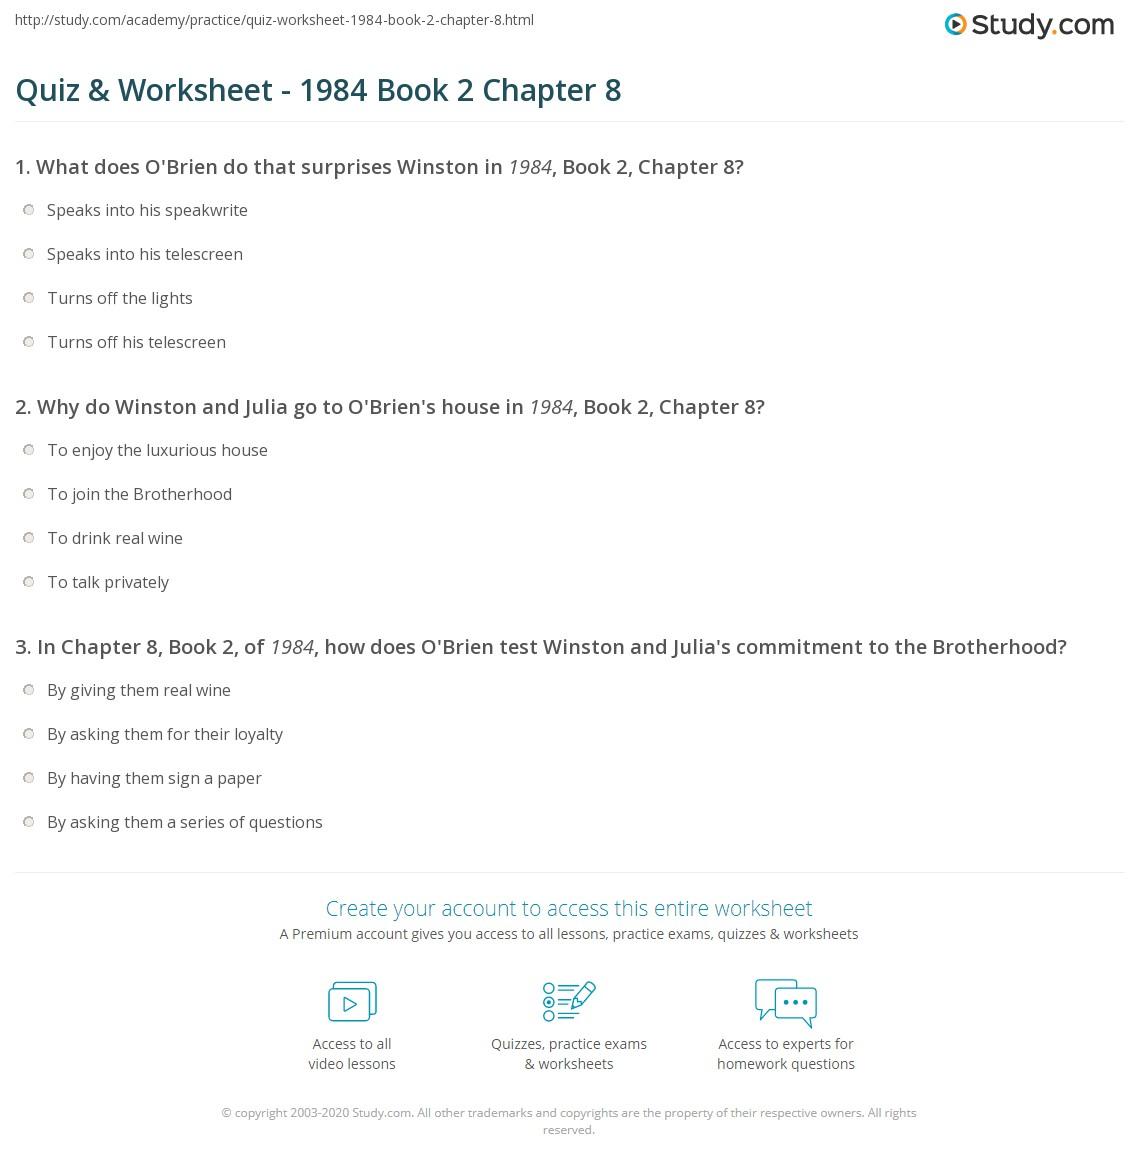 Quiz Worksheet 1984 Book 2 Chapter 8 Studycom